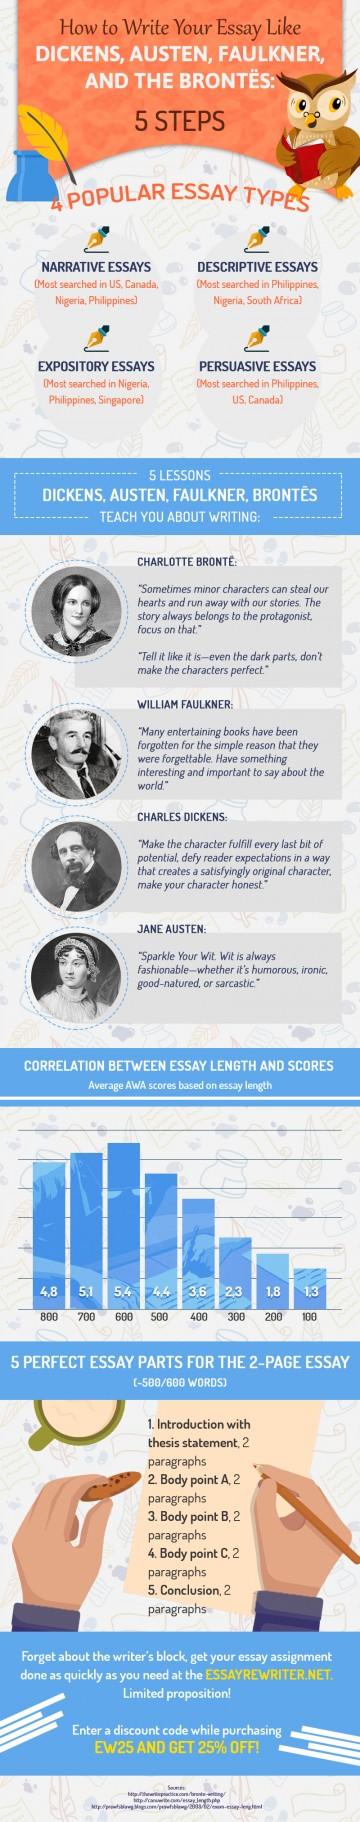 021 Essay Rewriter Example Writing Singular Free Software Crack Generator 360